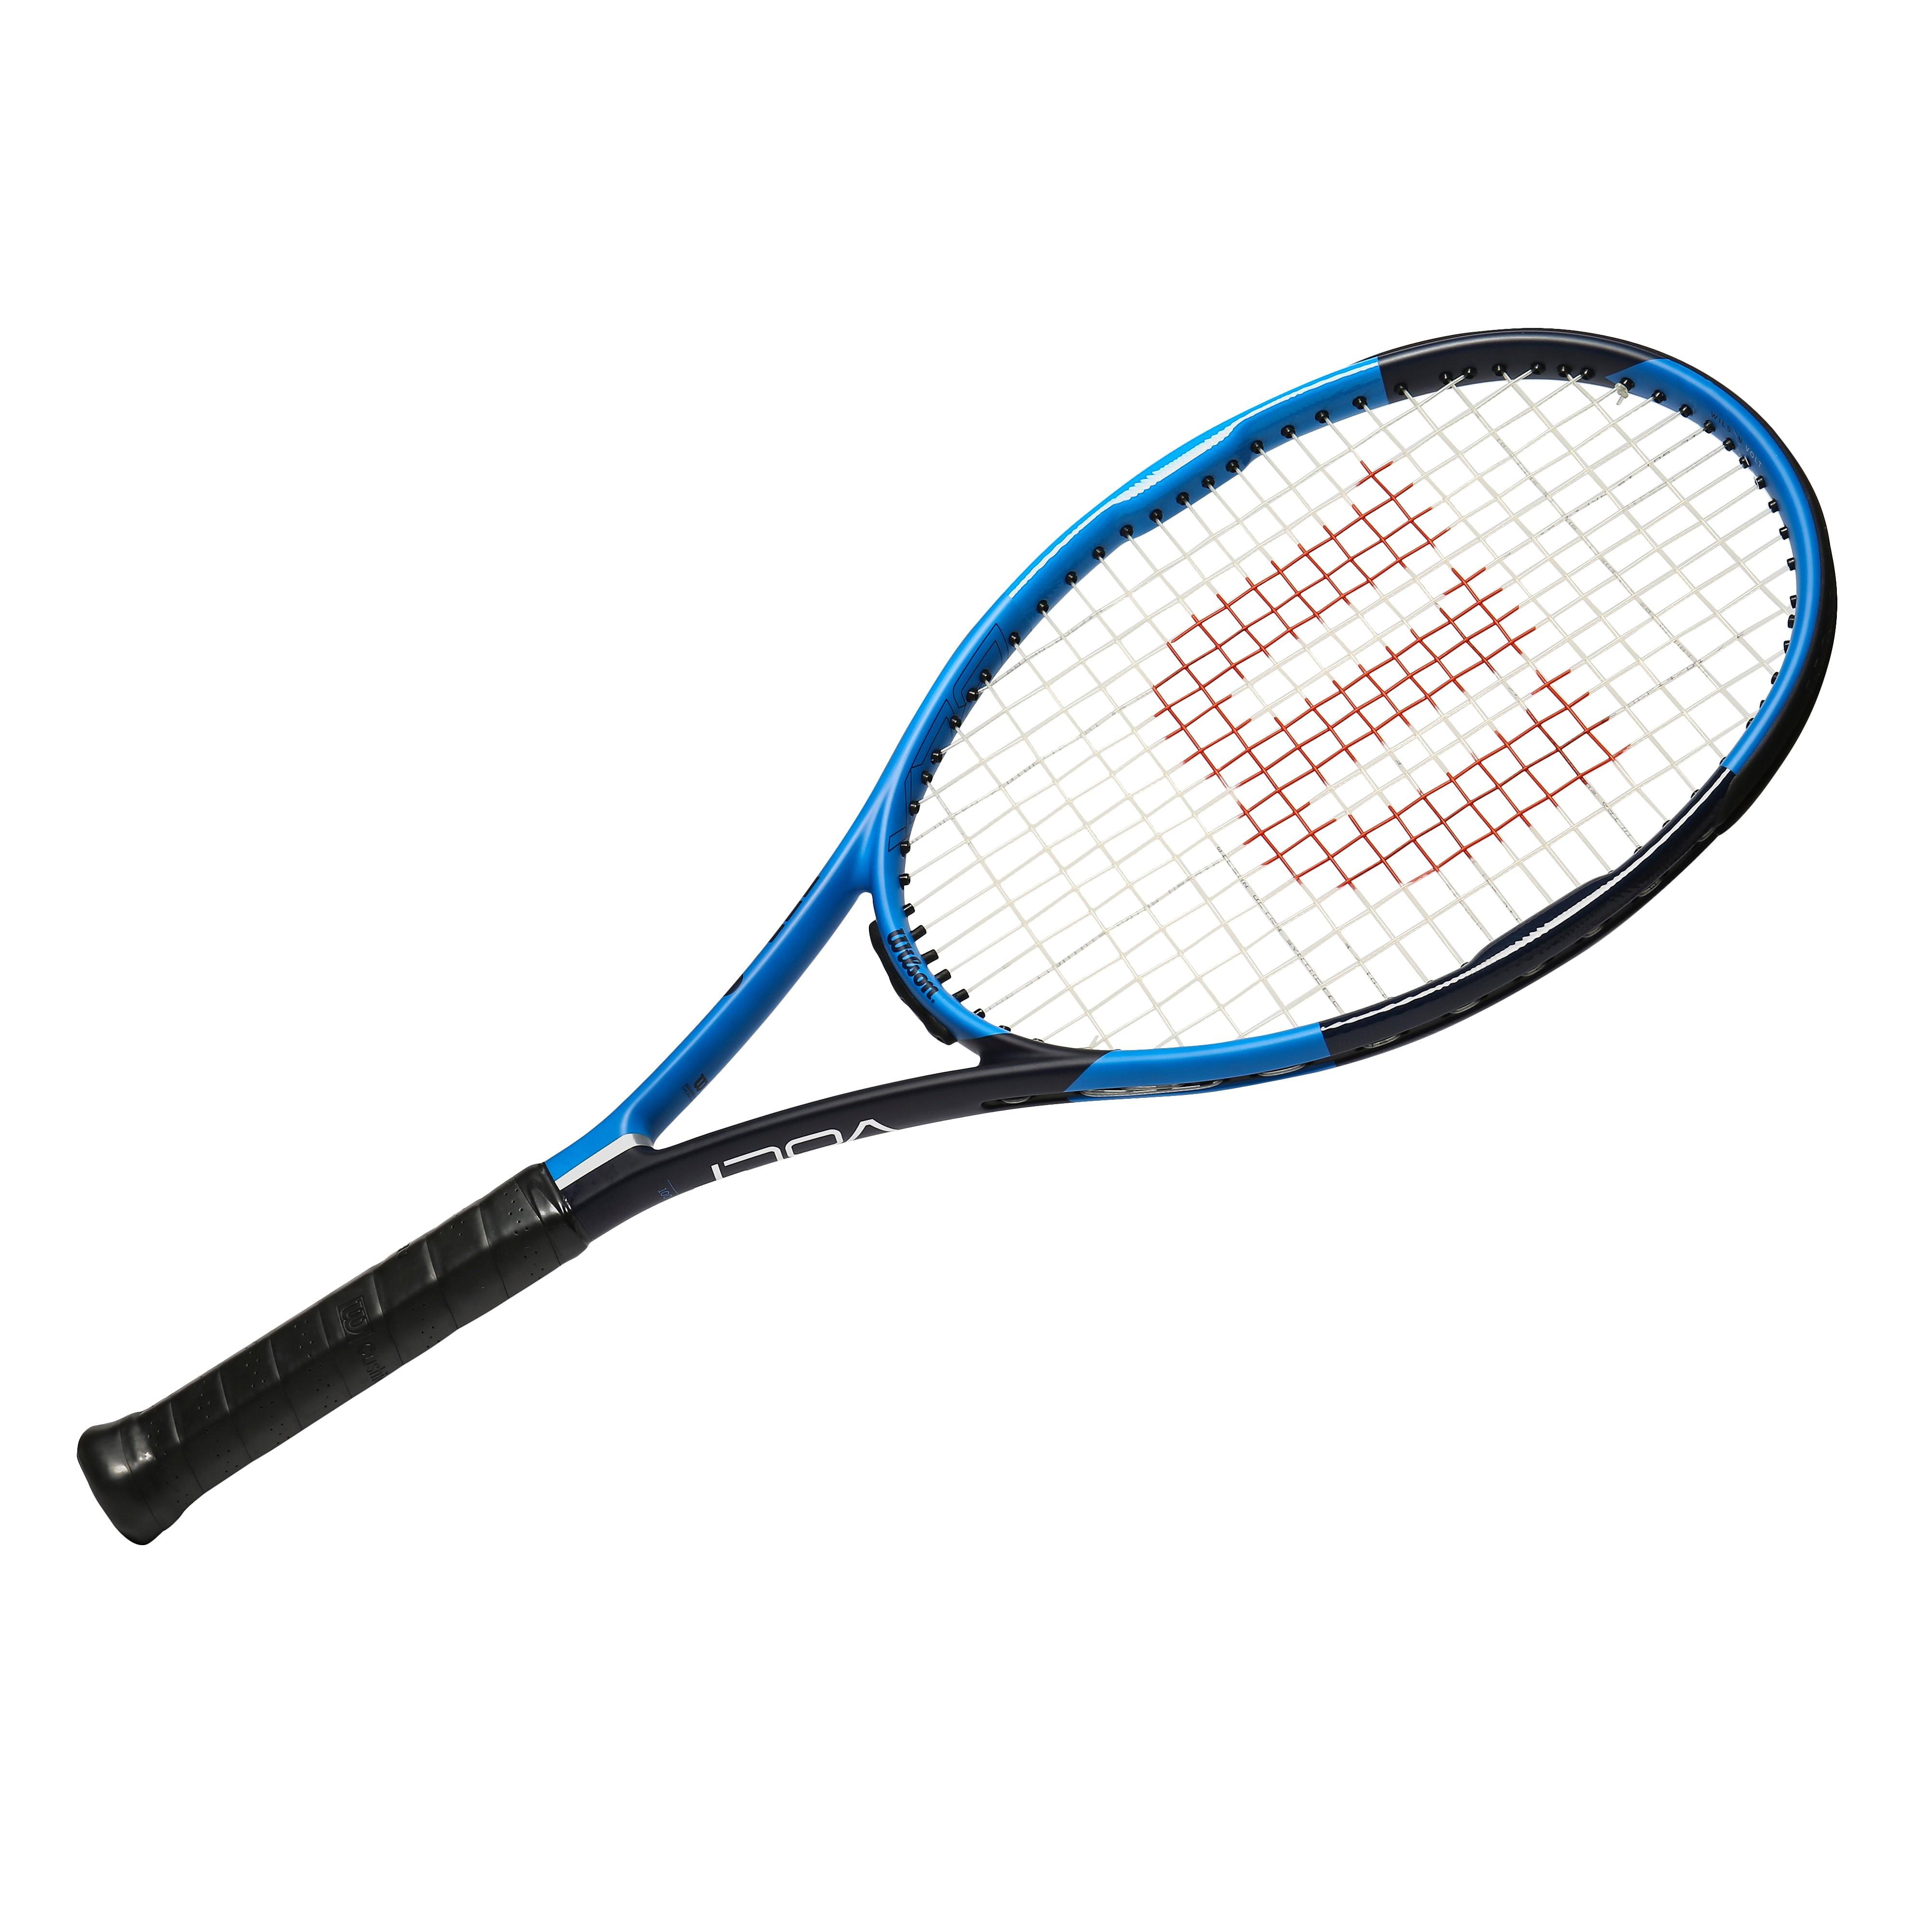 Wilson BLX Volt Tennis Racket